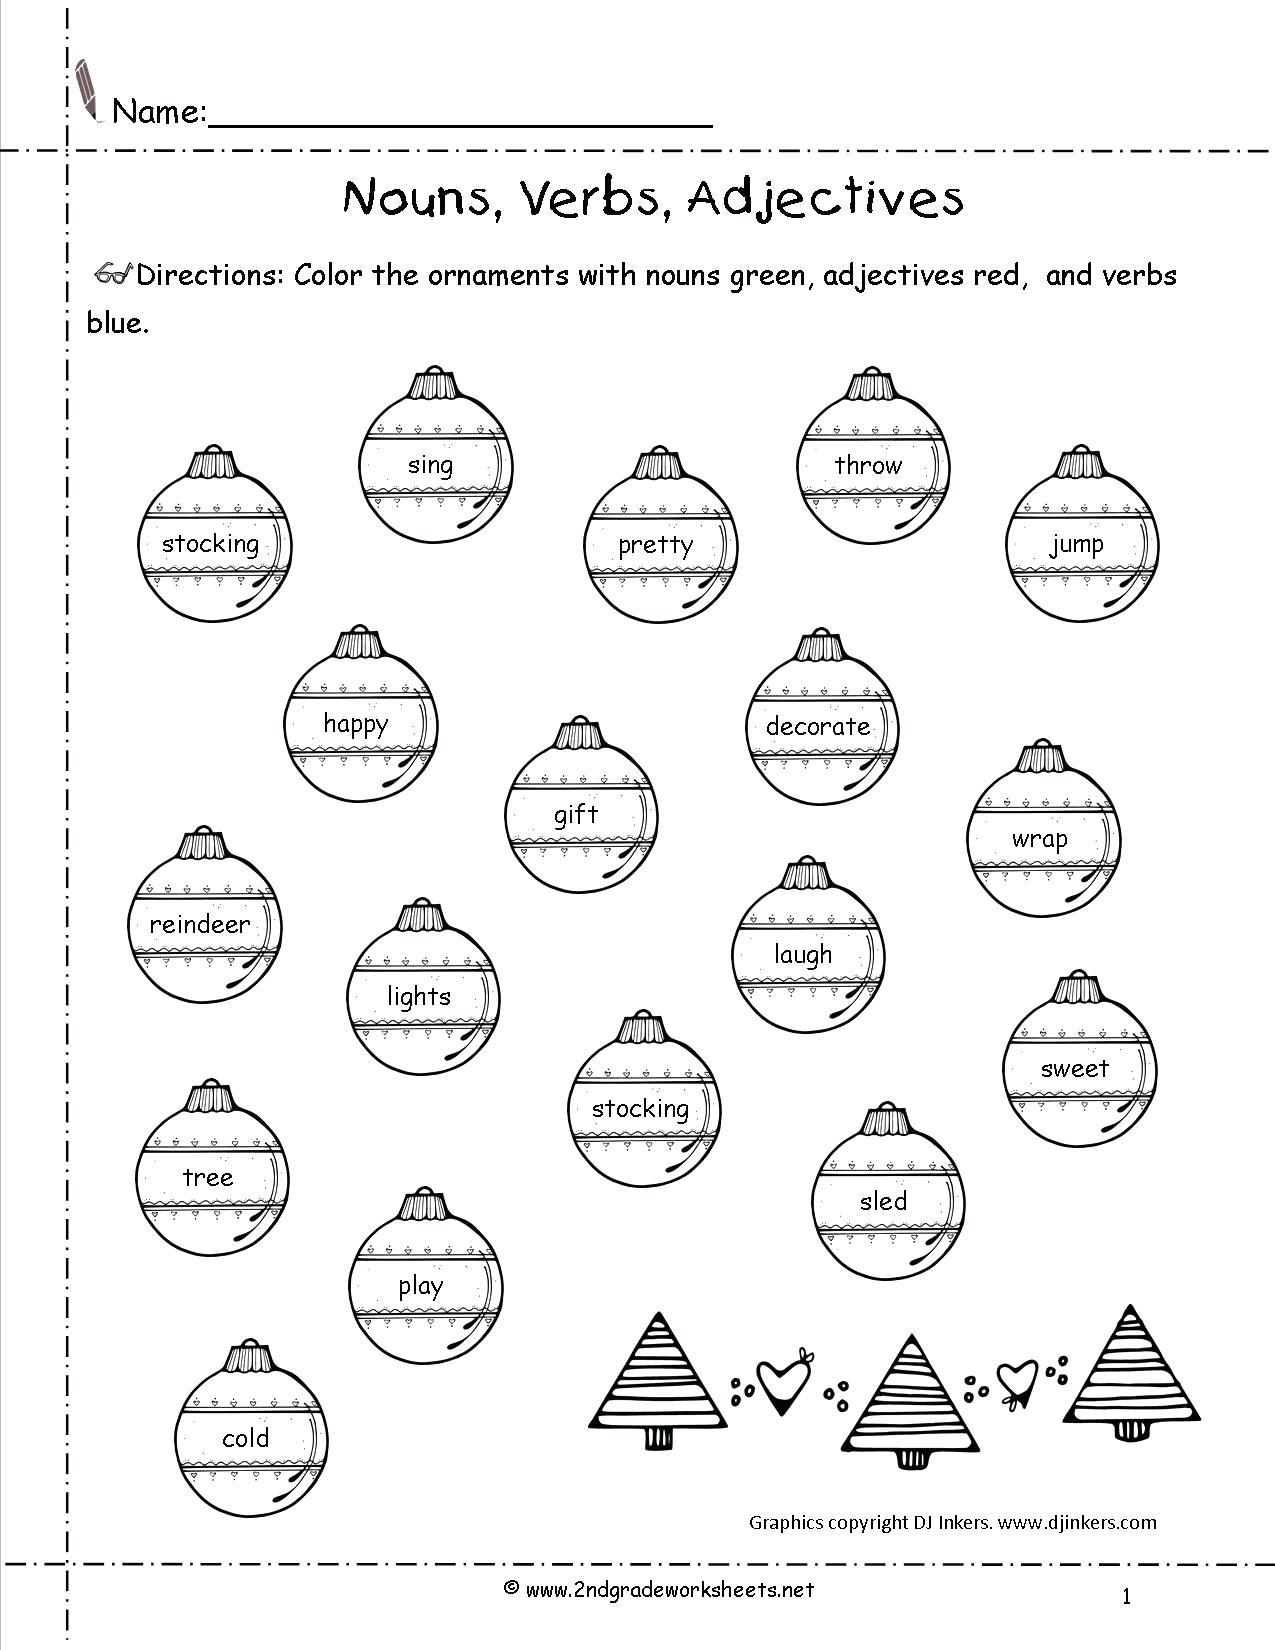 Free Christmas Worksheets Printables Ornaments Free Christmas - Free Printable Worksheets Uk